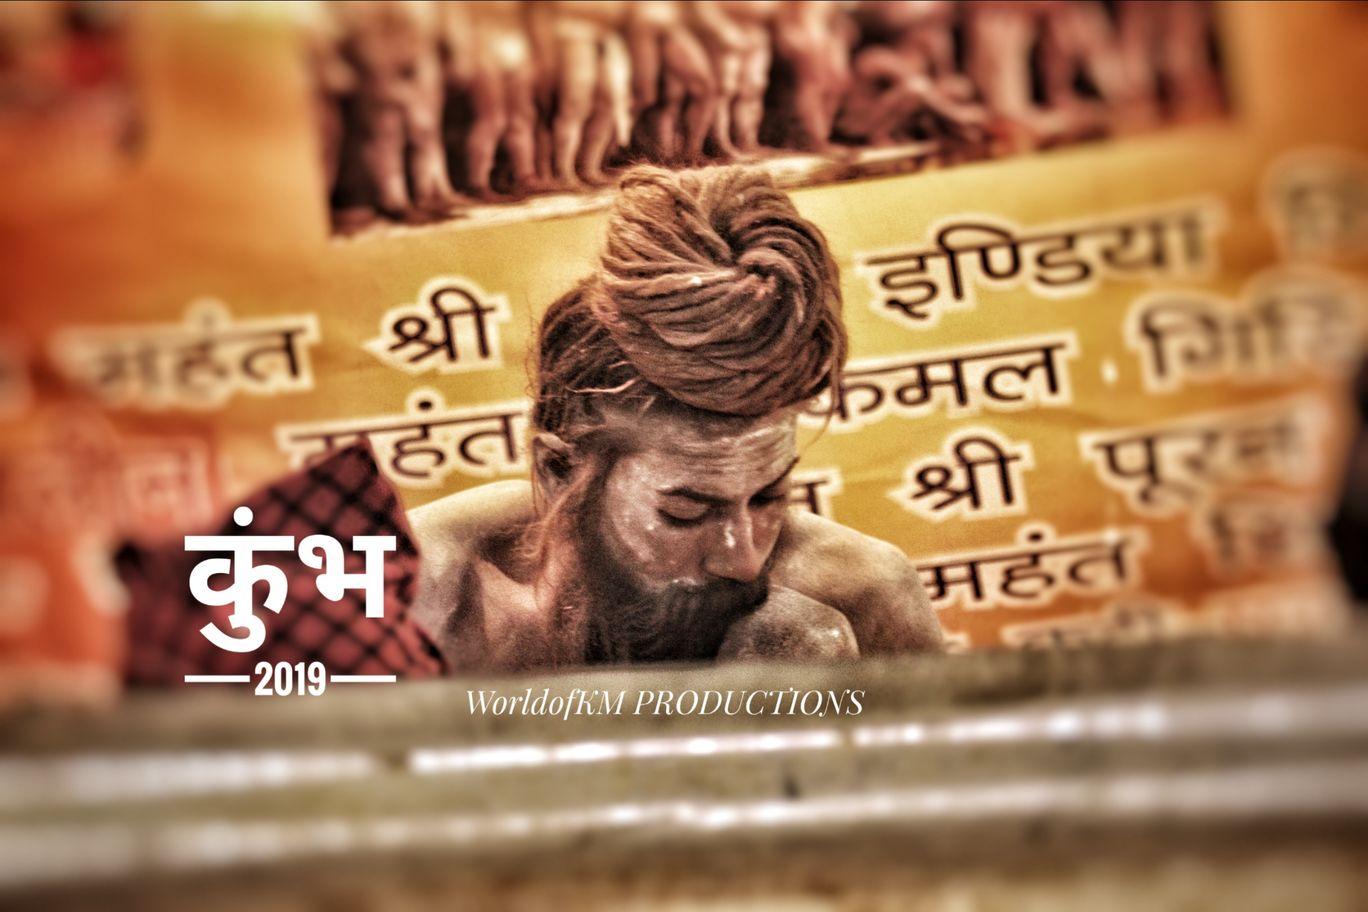 Photo of kumbh mela 2019 By Kamlesh Mandriya